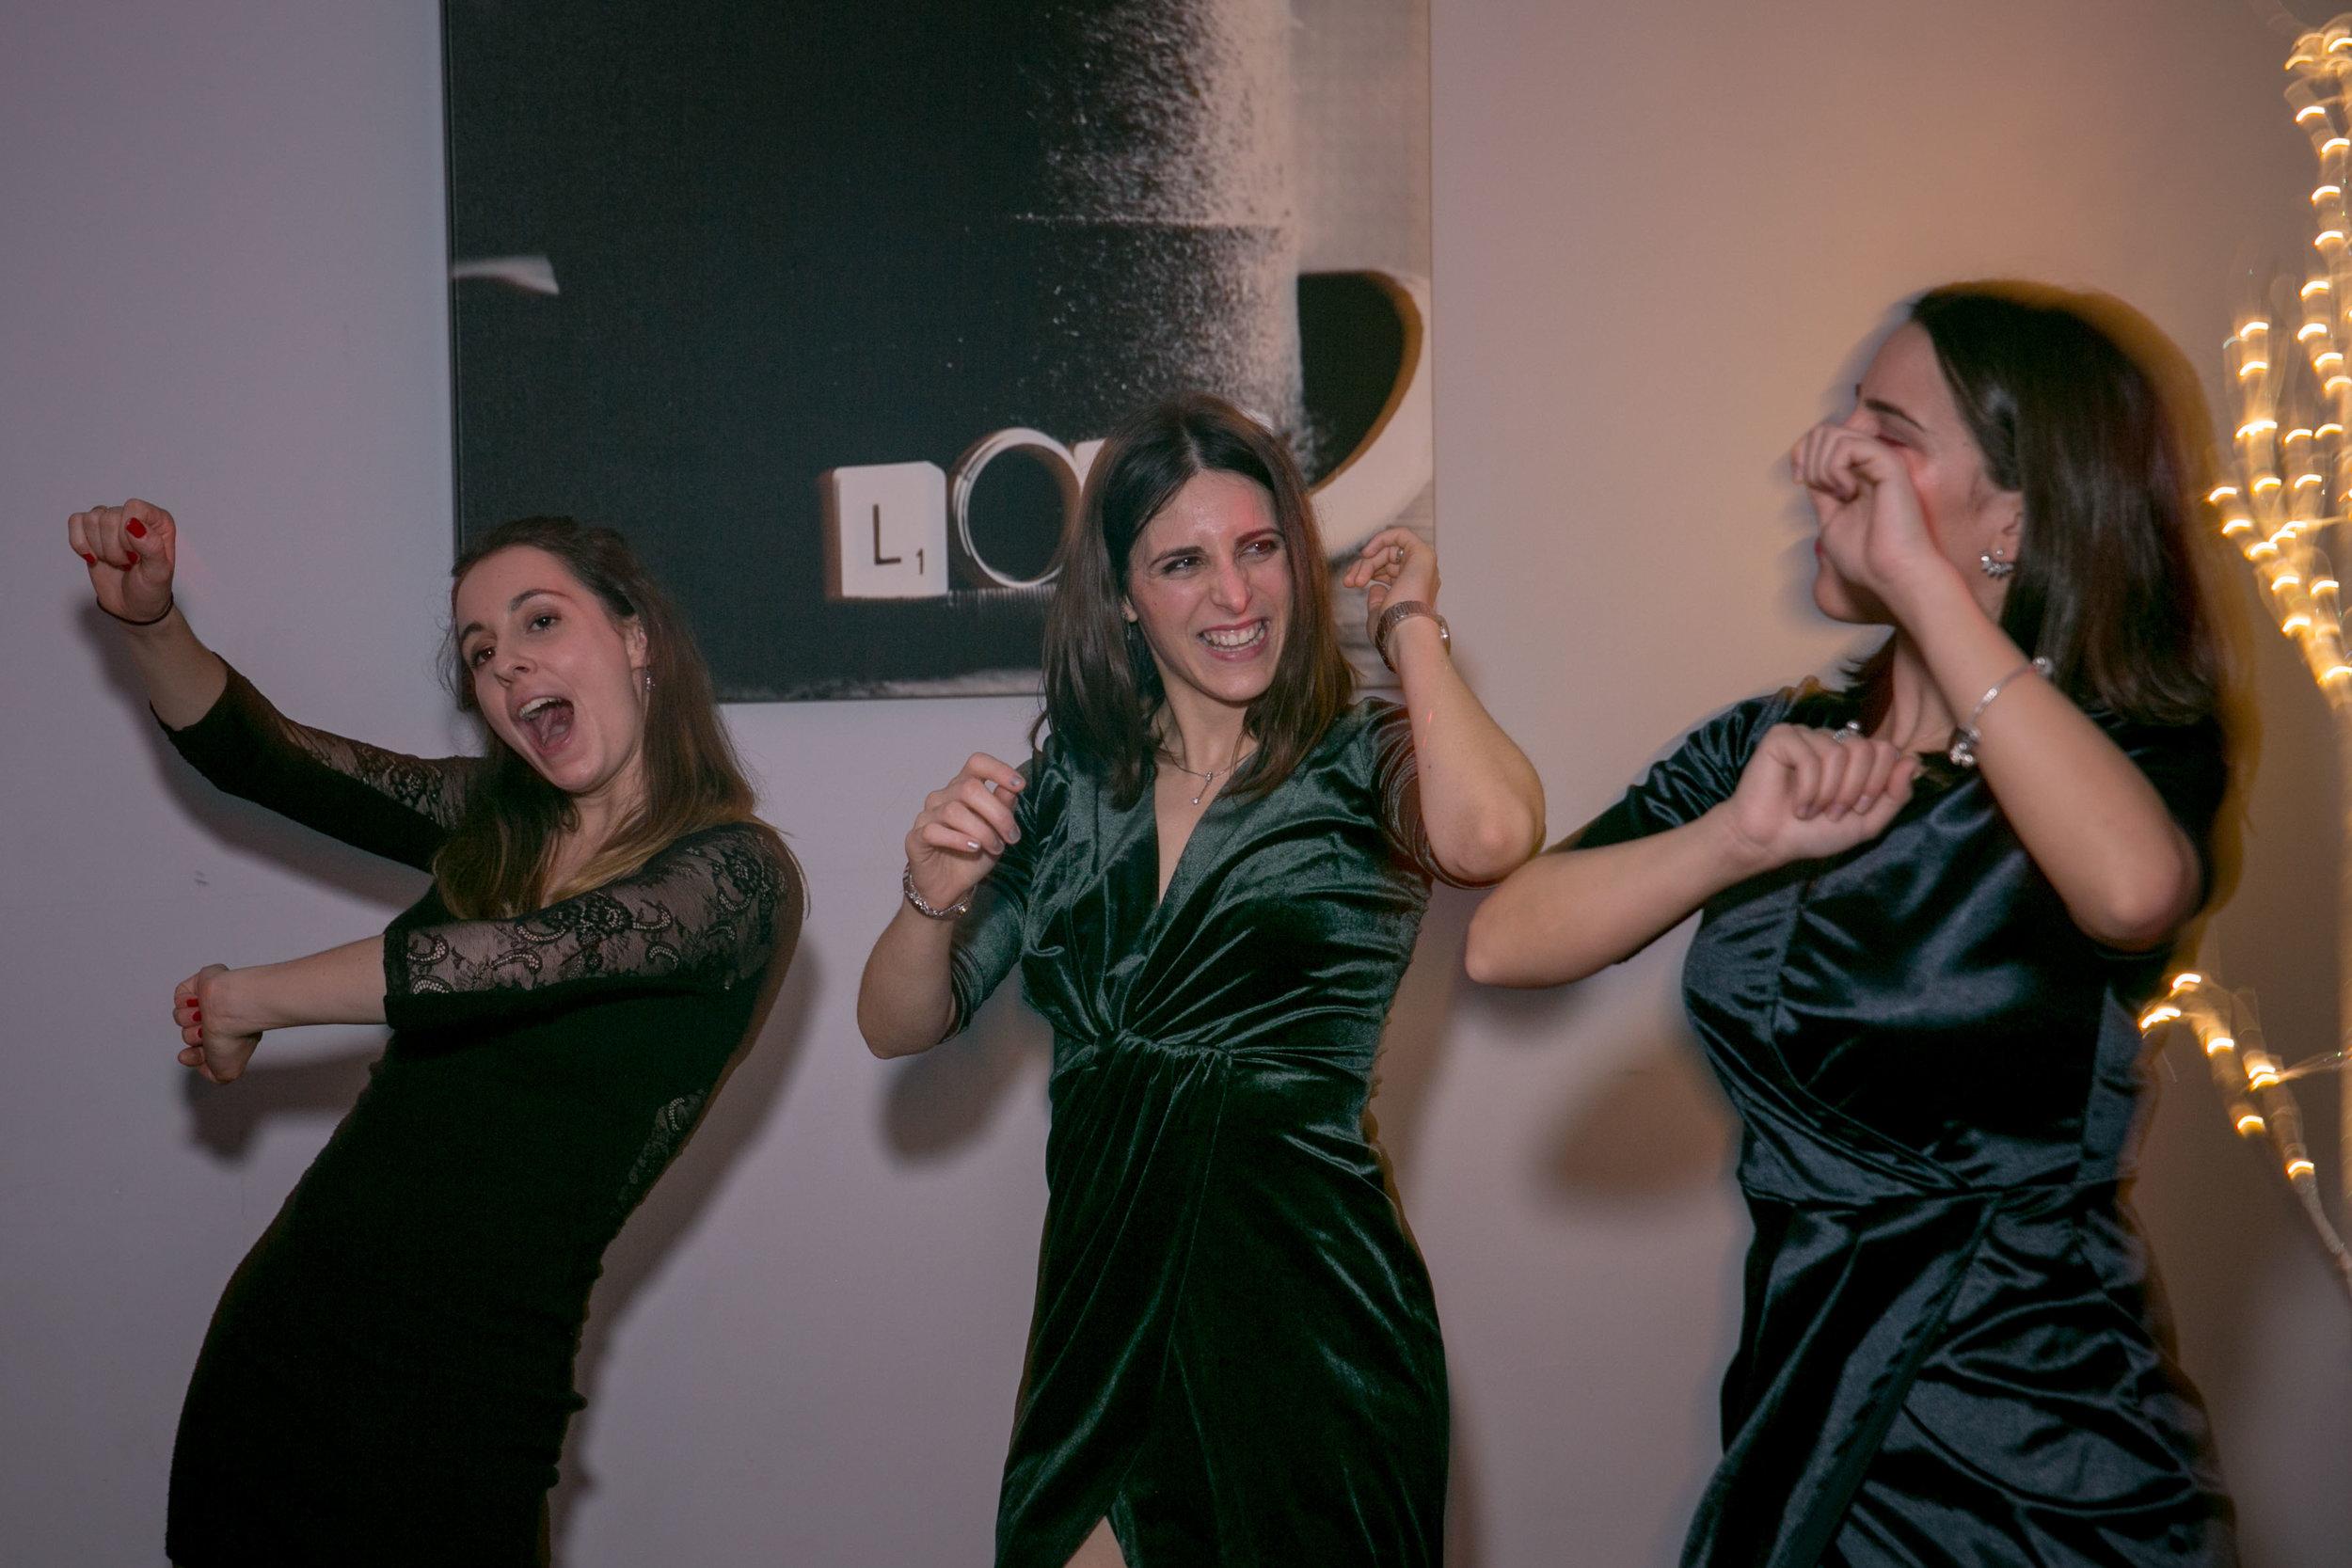 hilton-double-tree-cadbury-house-surprise-birthday-party-photography-natalia-smith-photography-36.jpg